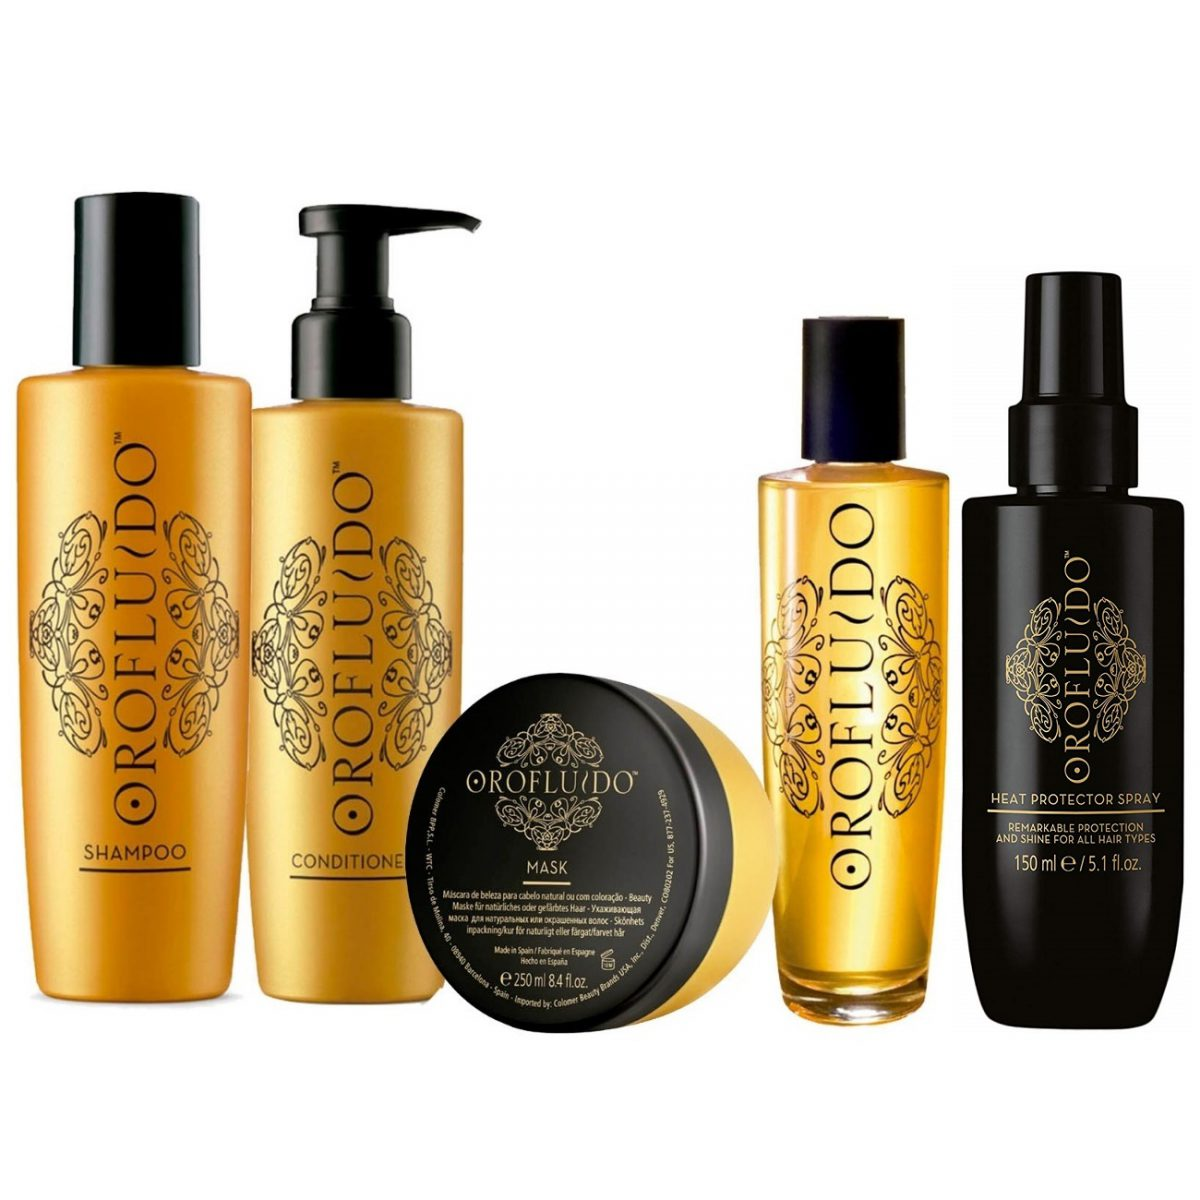 13_Revlon_Profesional_Orofluido_Shampoo_200ml_Acondicionador_200ml_Mascarilla_250ml_Elixir_50ml_Heat_Protector_Spray_150ml.jpg